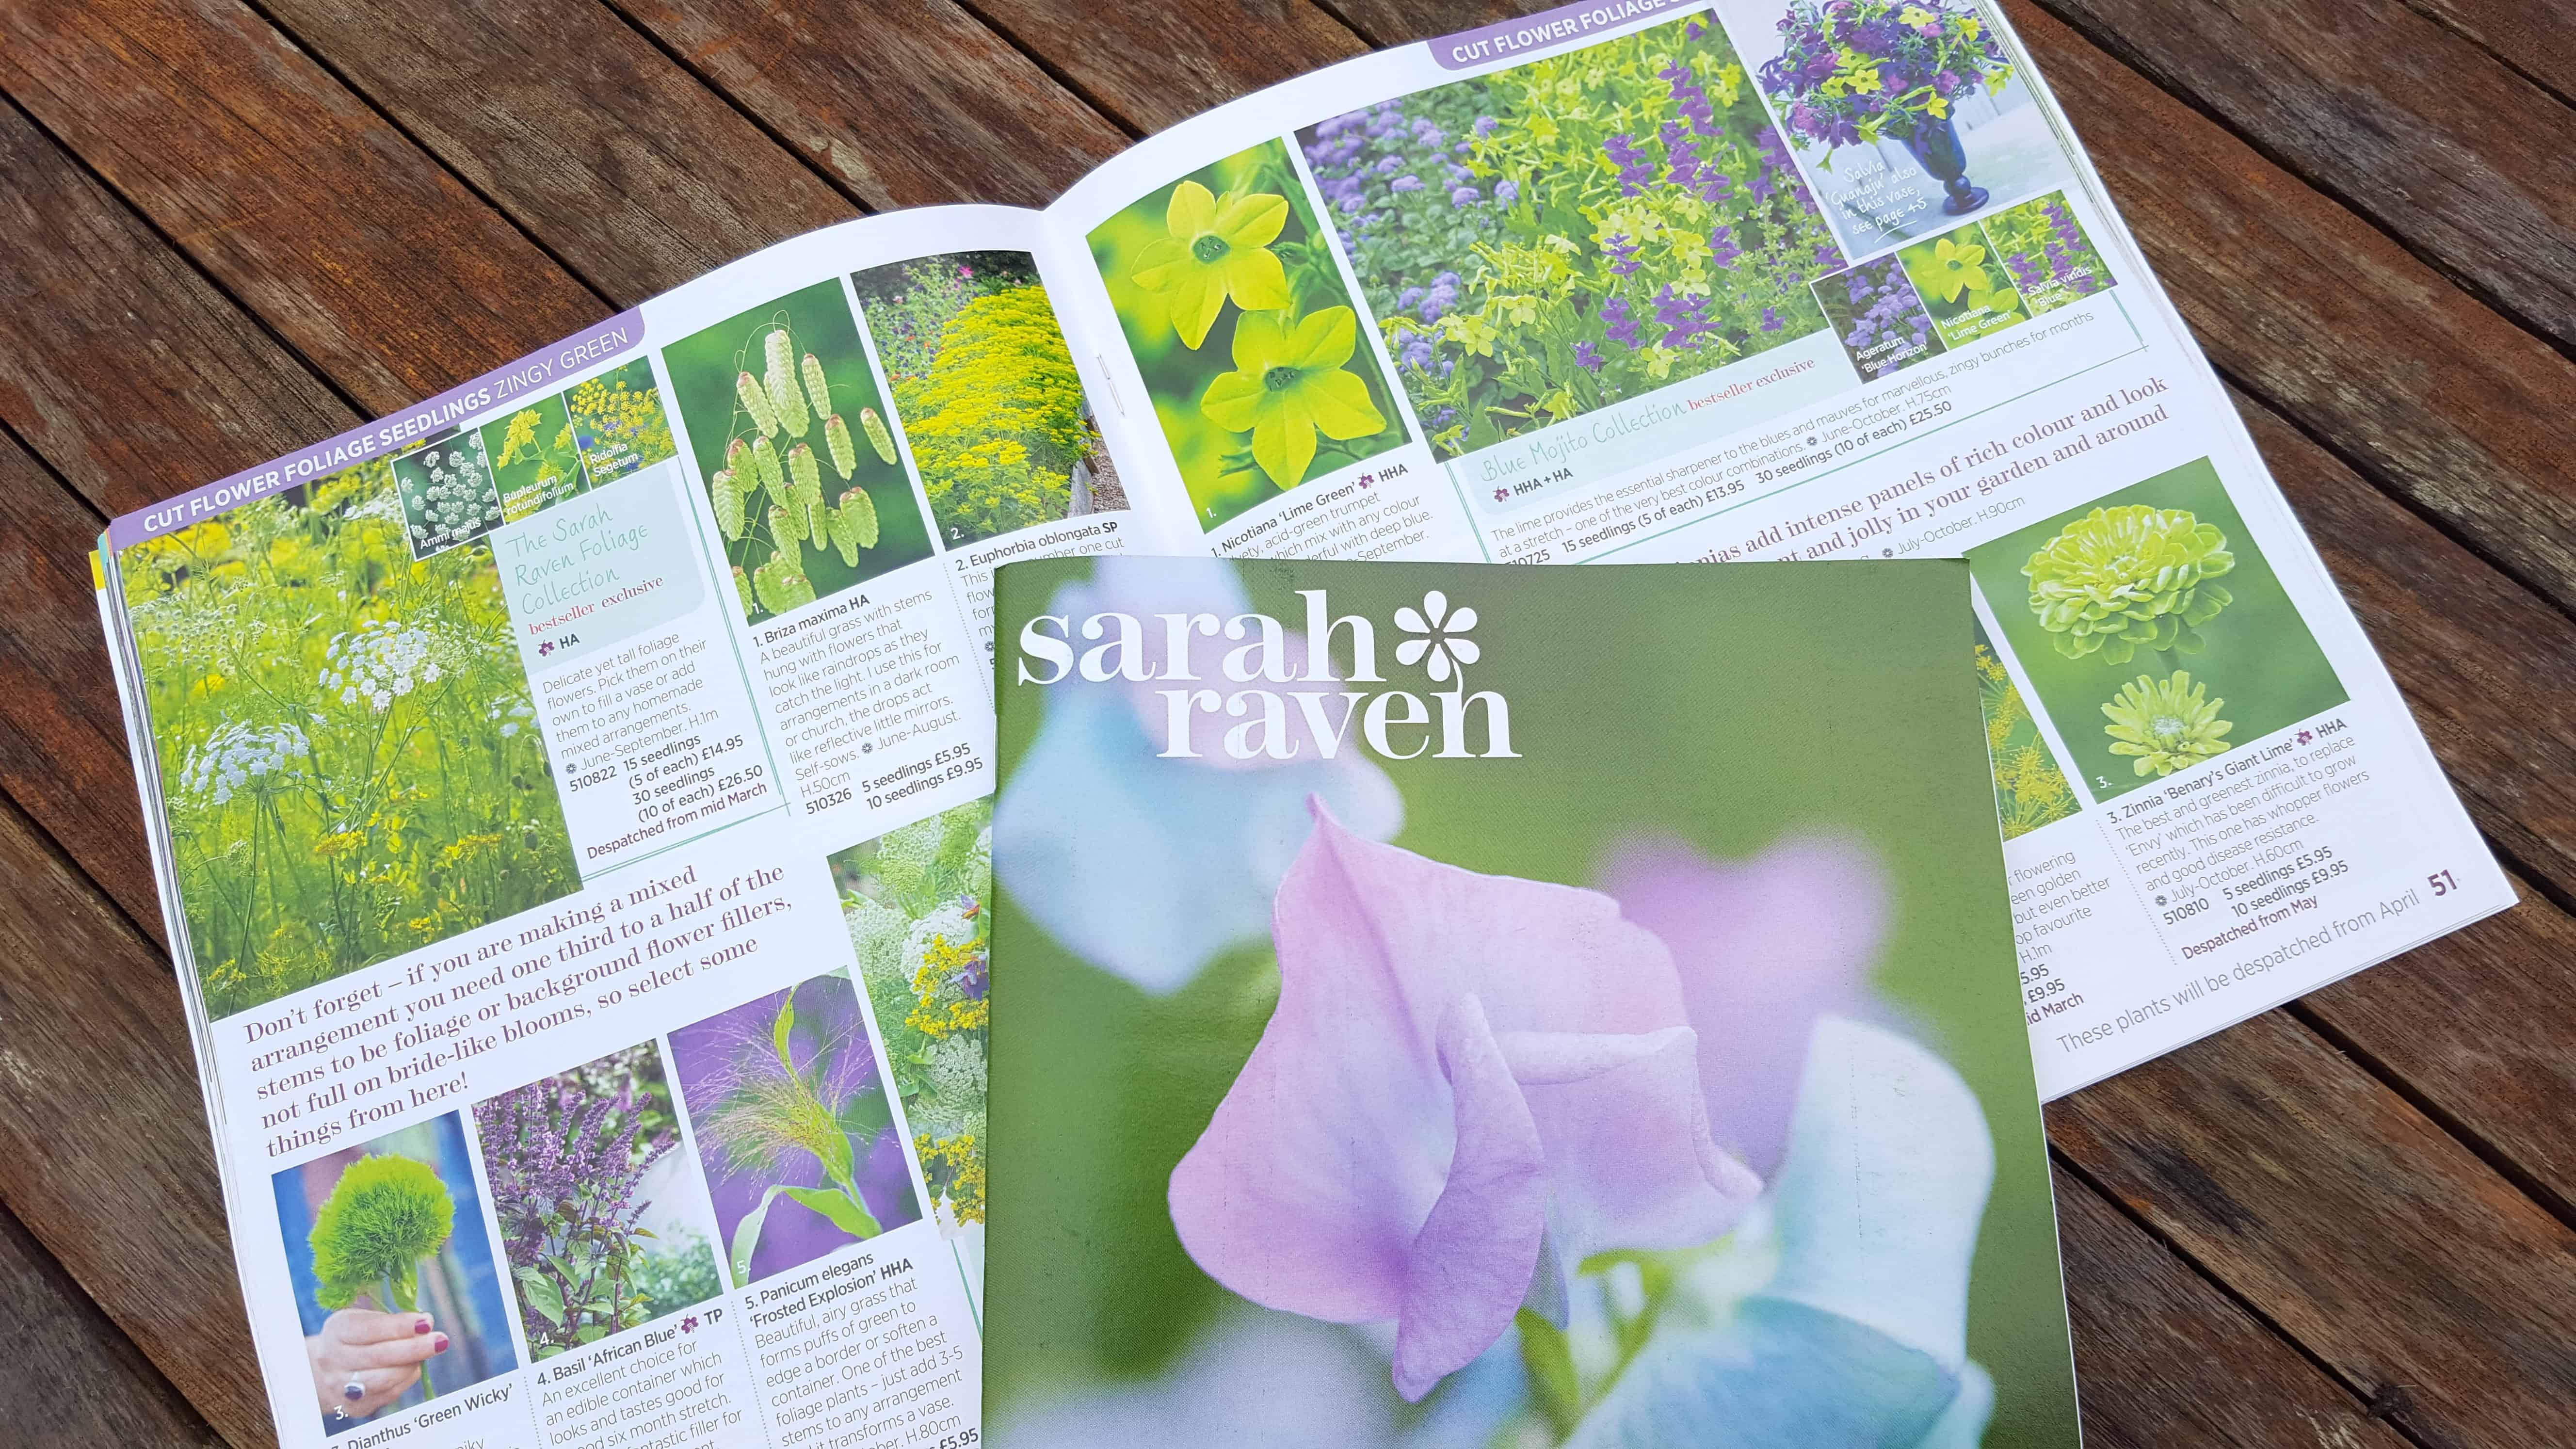 January-in-the-garden_-www.lisanotebook.com